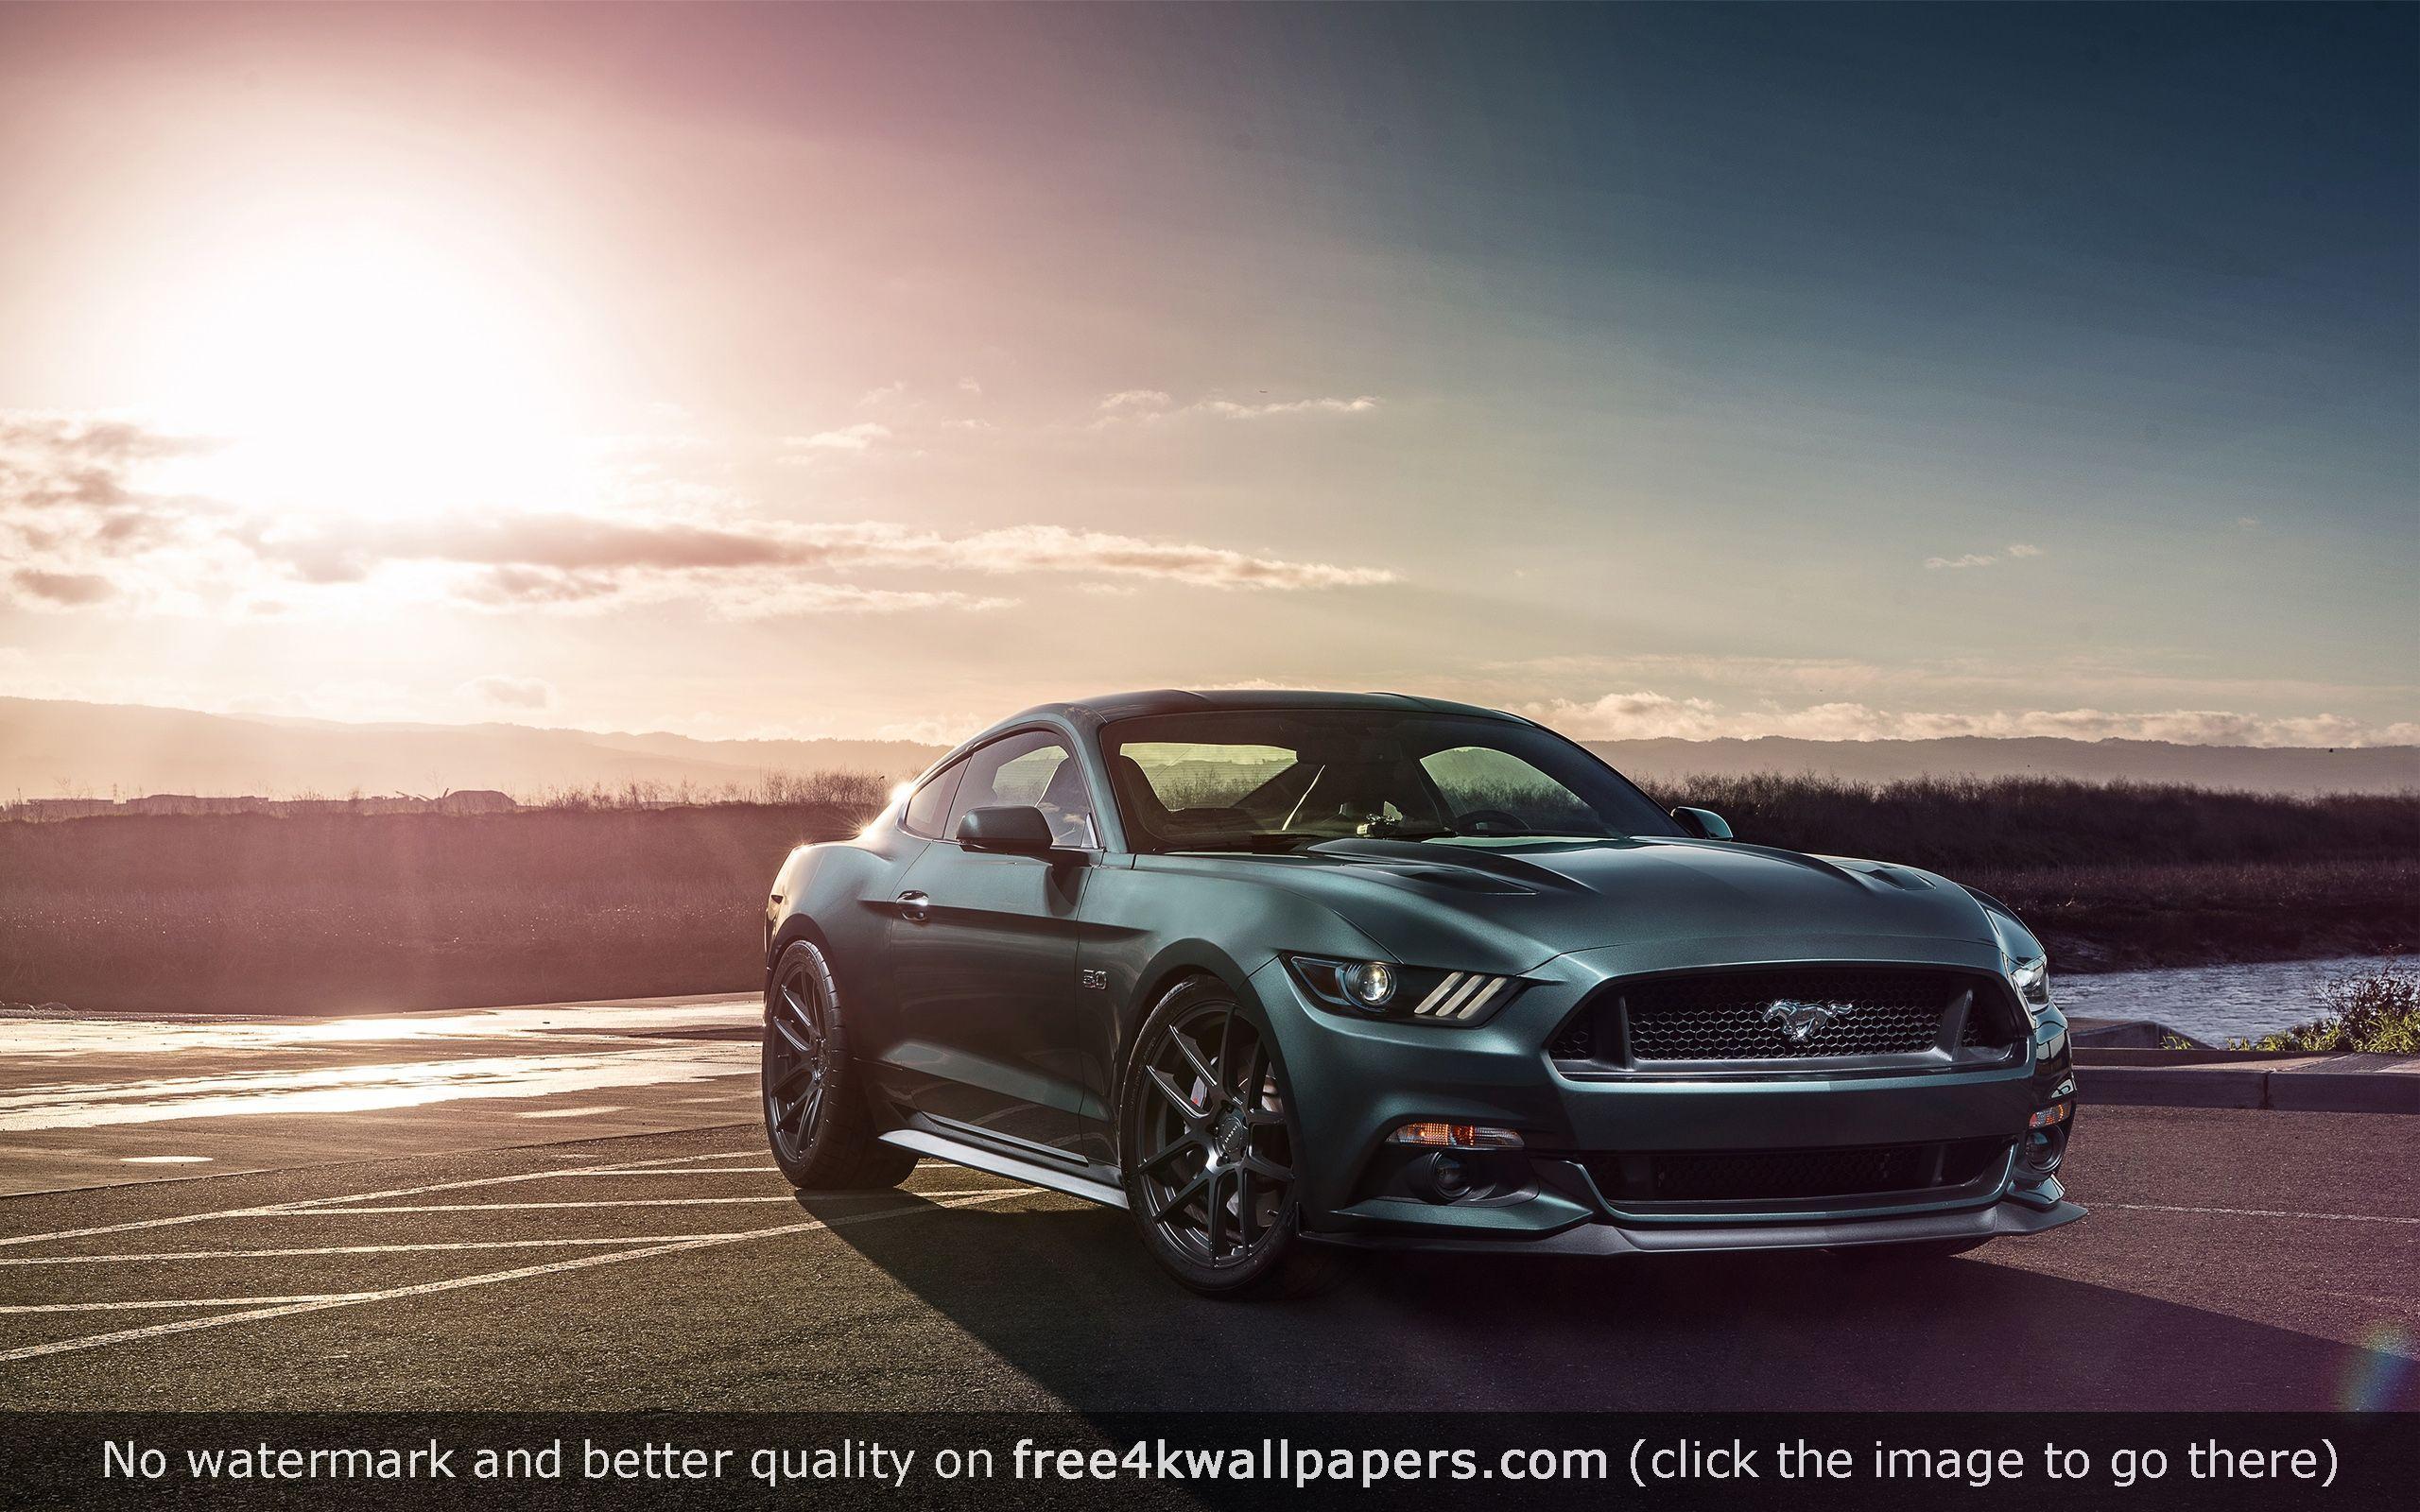 Ford Mustang S550 Wallpaper Desktop Mustang Gt Ford Mustang